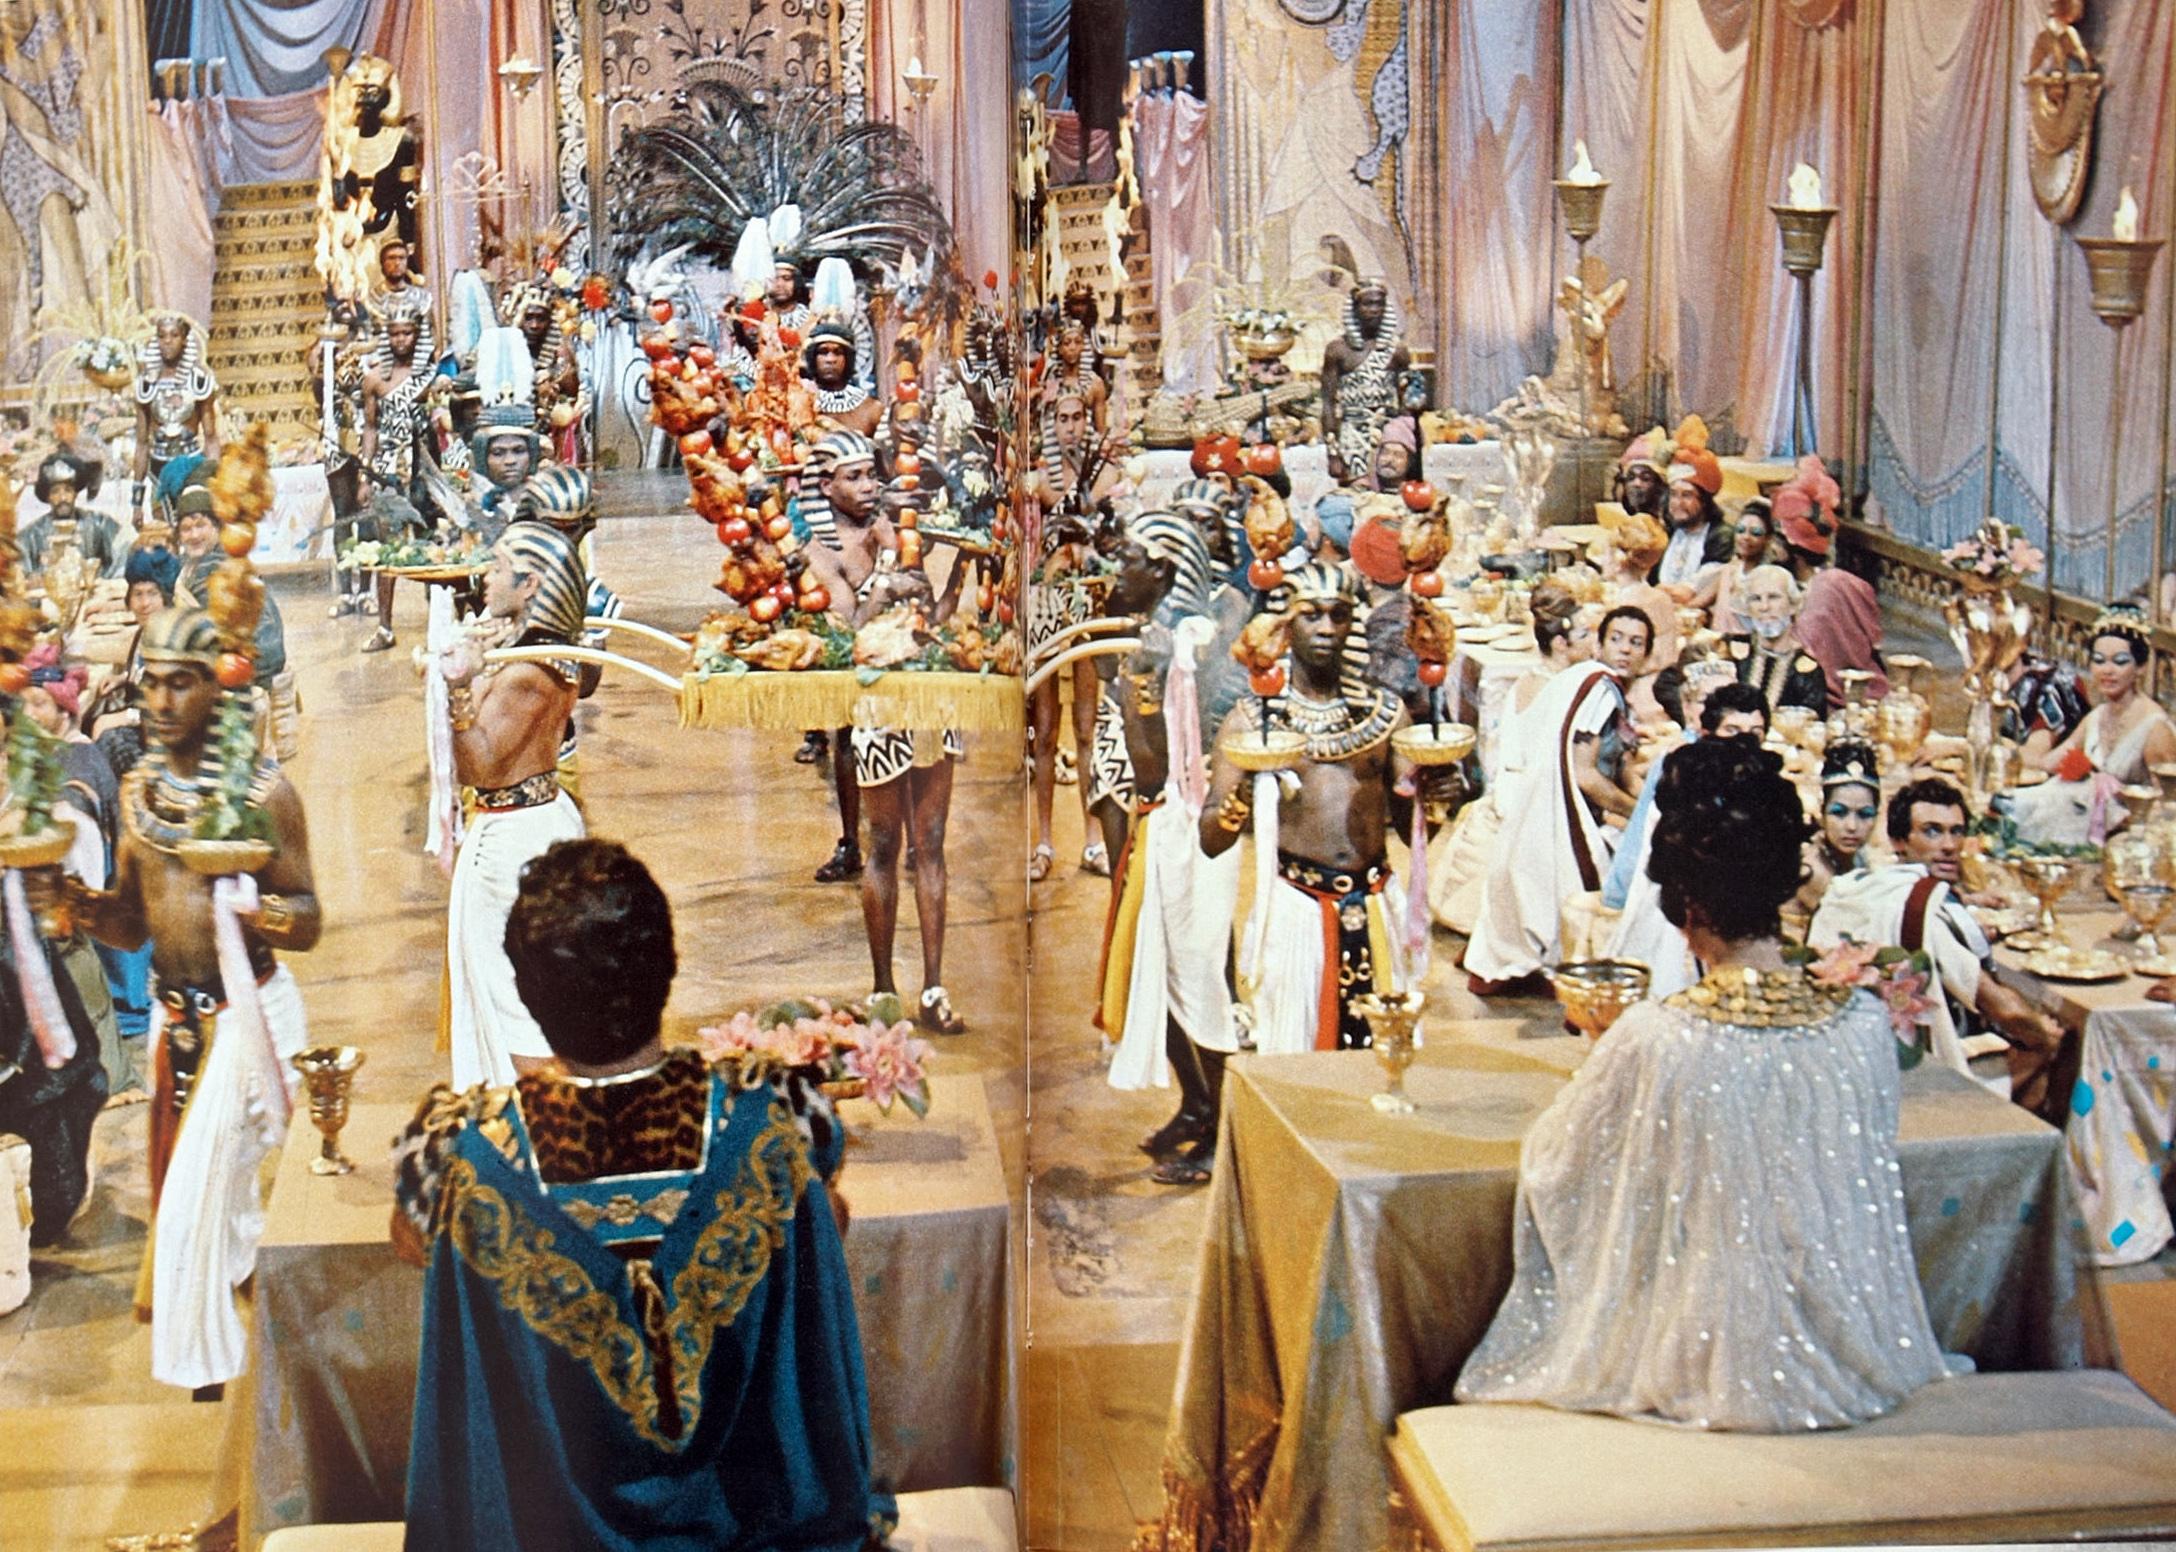 Cleopatra 1963 Elizabeth Taylor Cleopatra 1963 - Eliza...